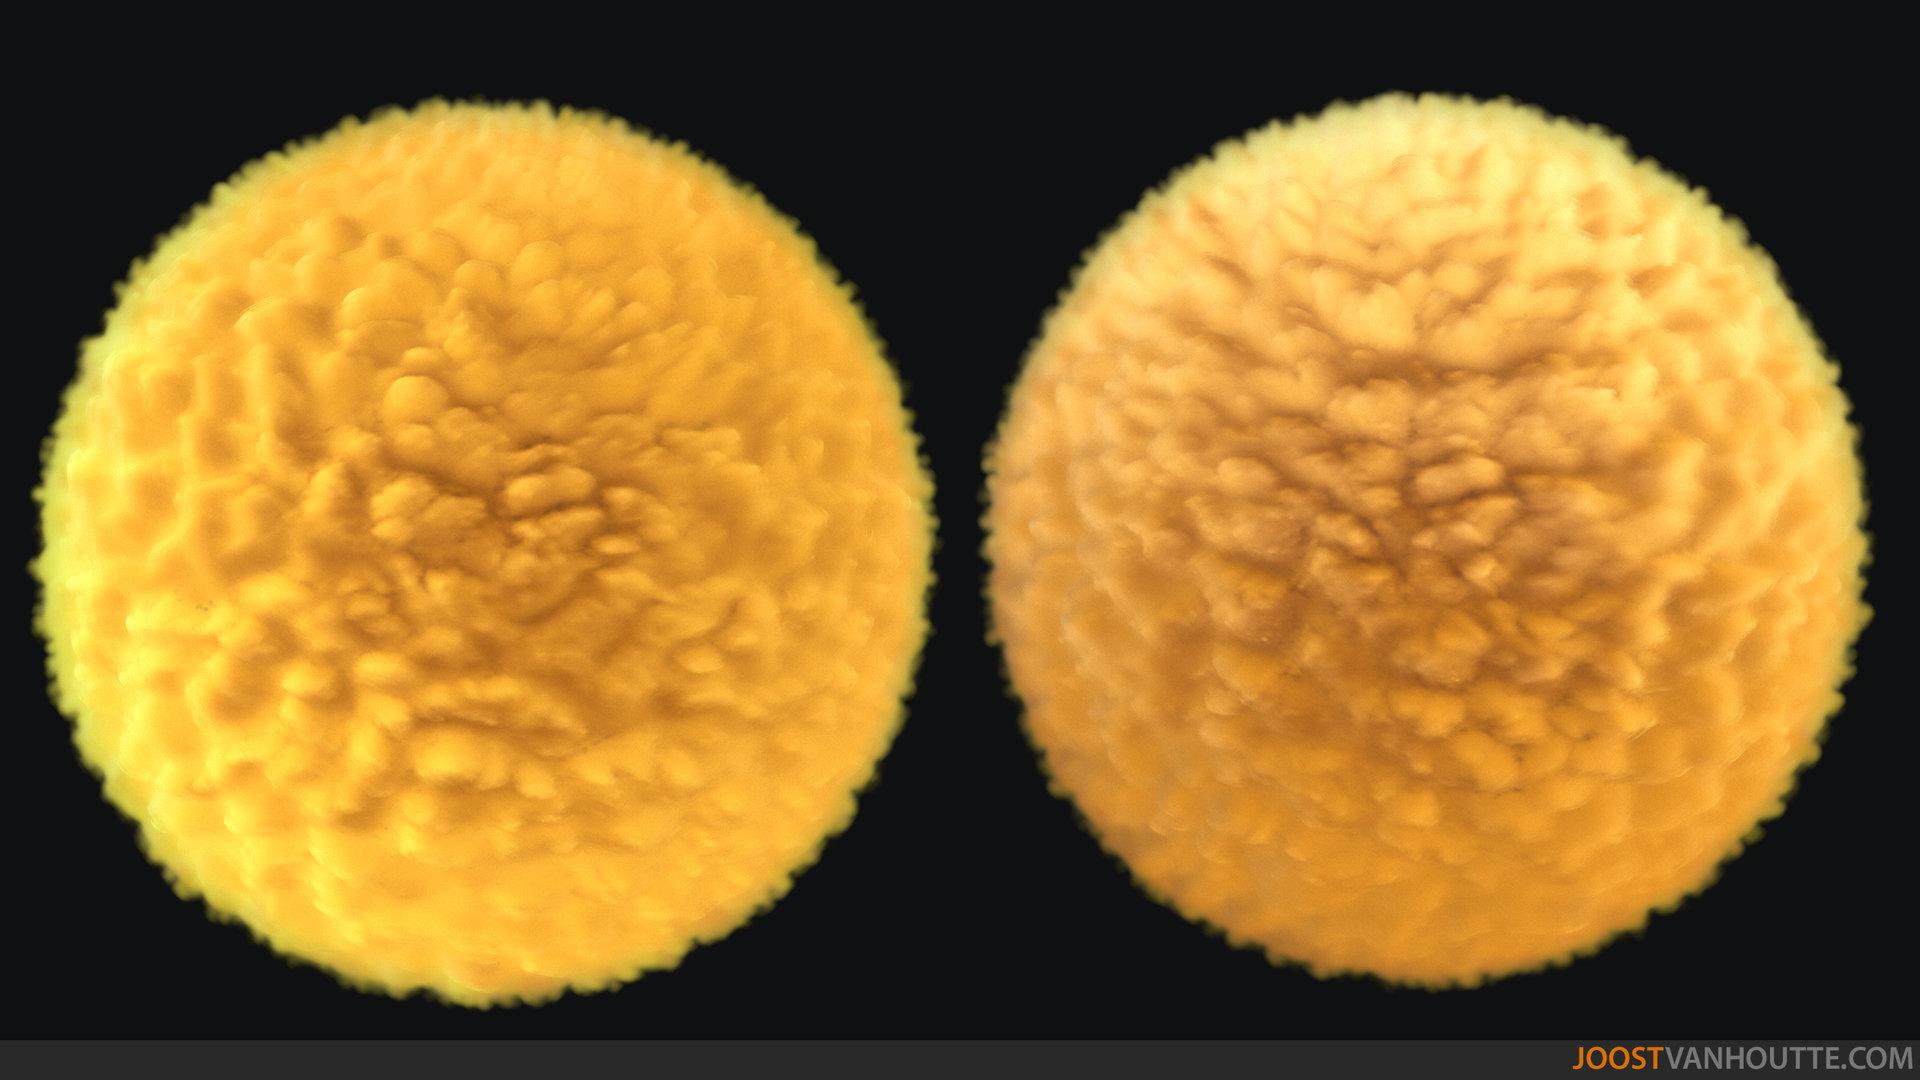 joost-vanhoutte-furryballs.jpg?1438512832